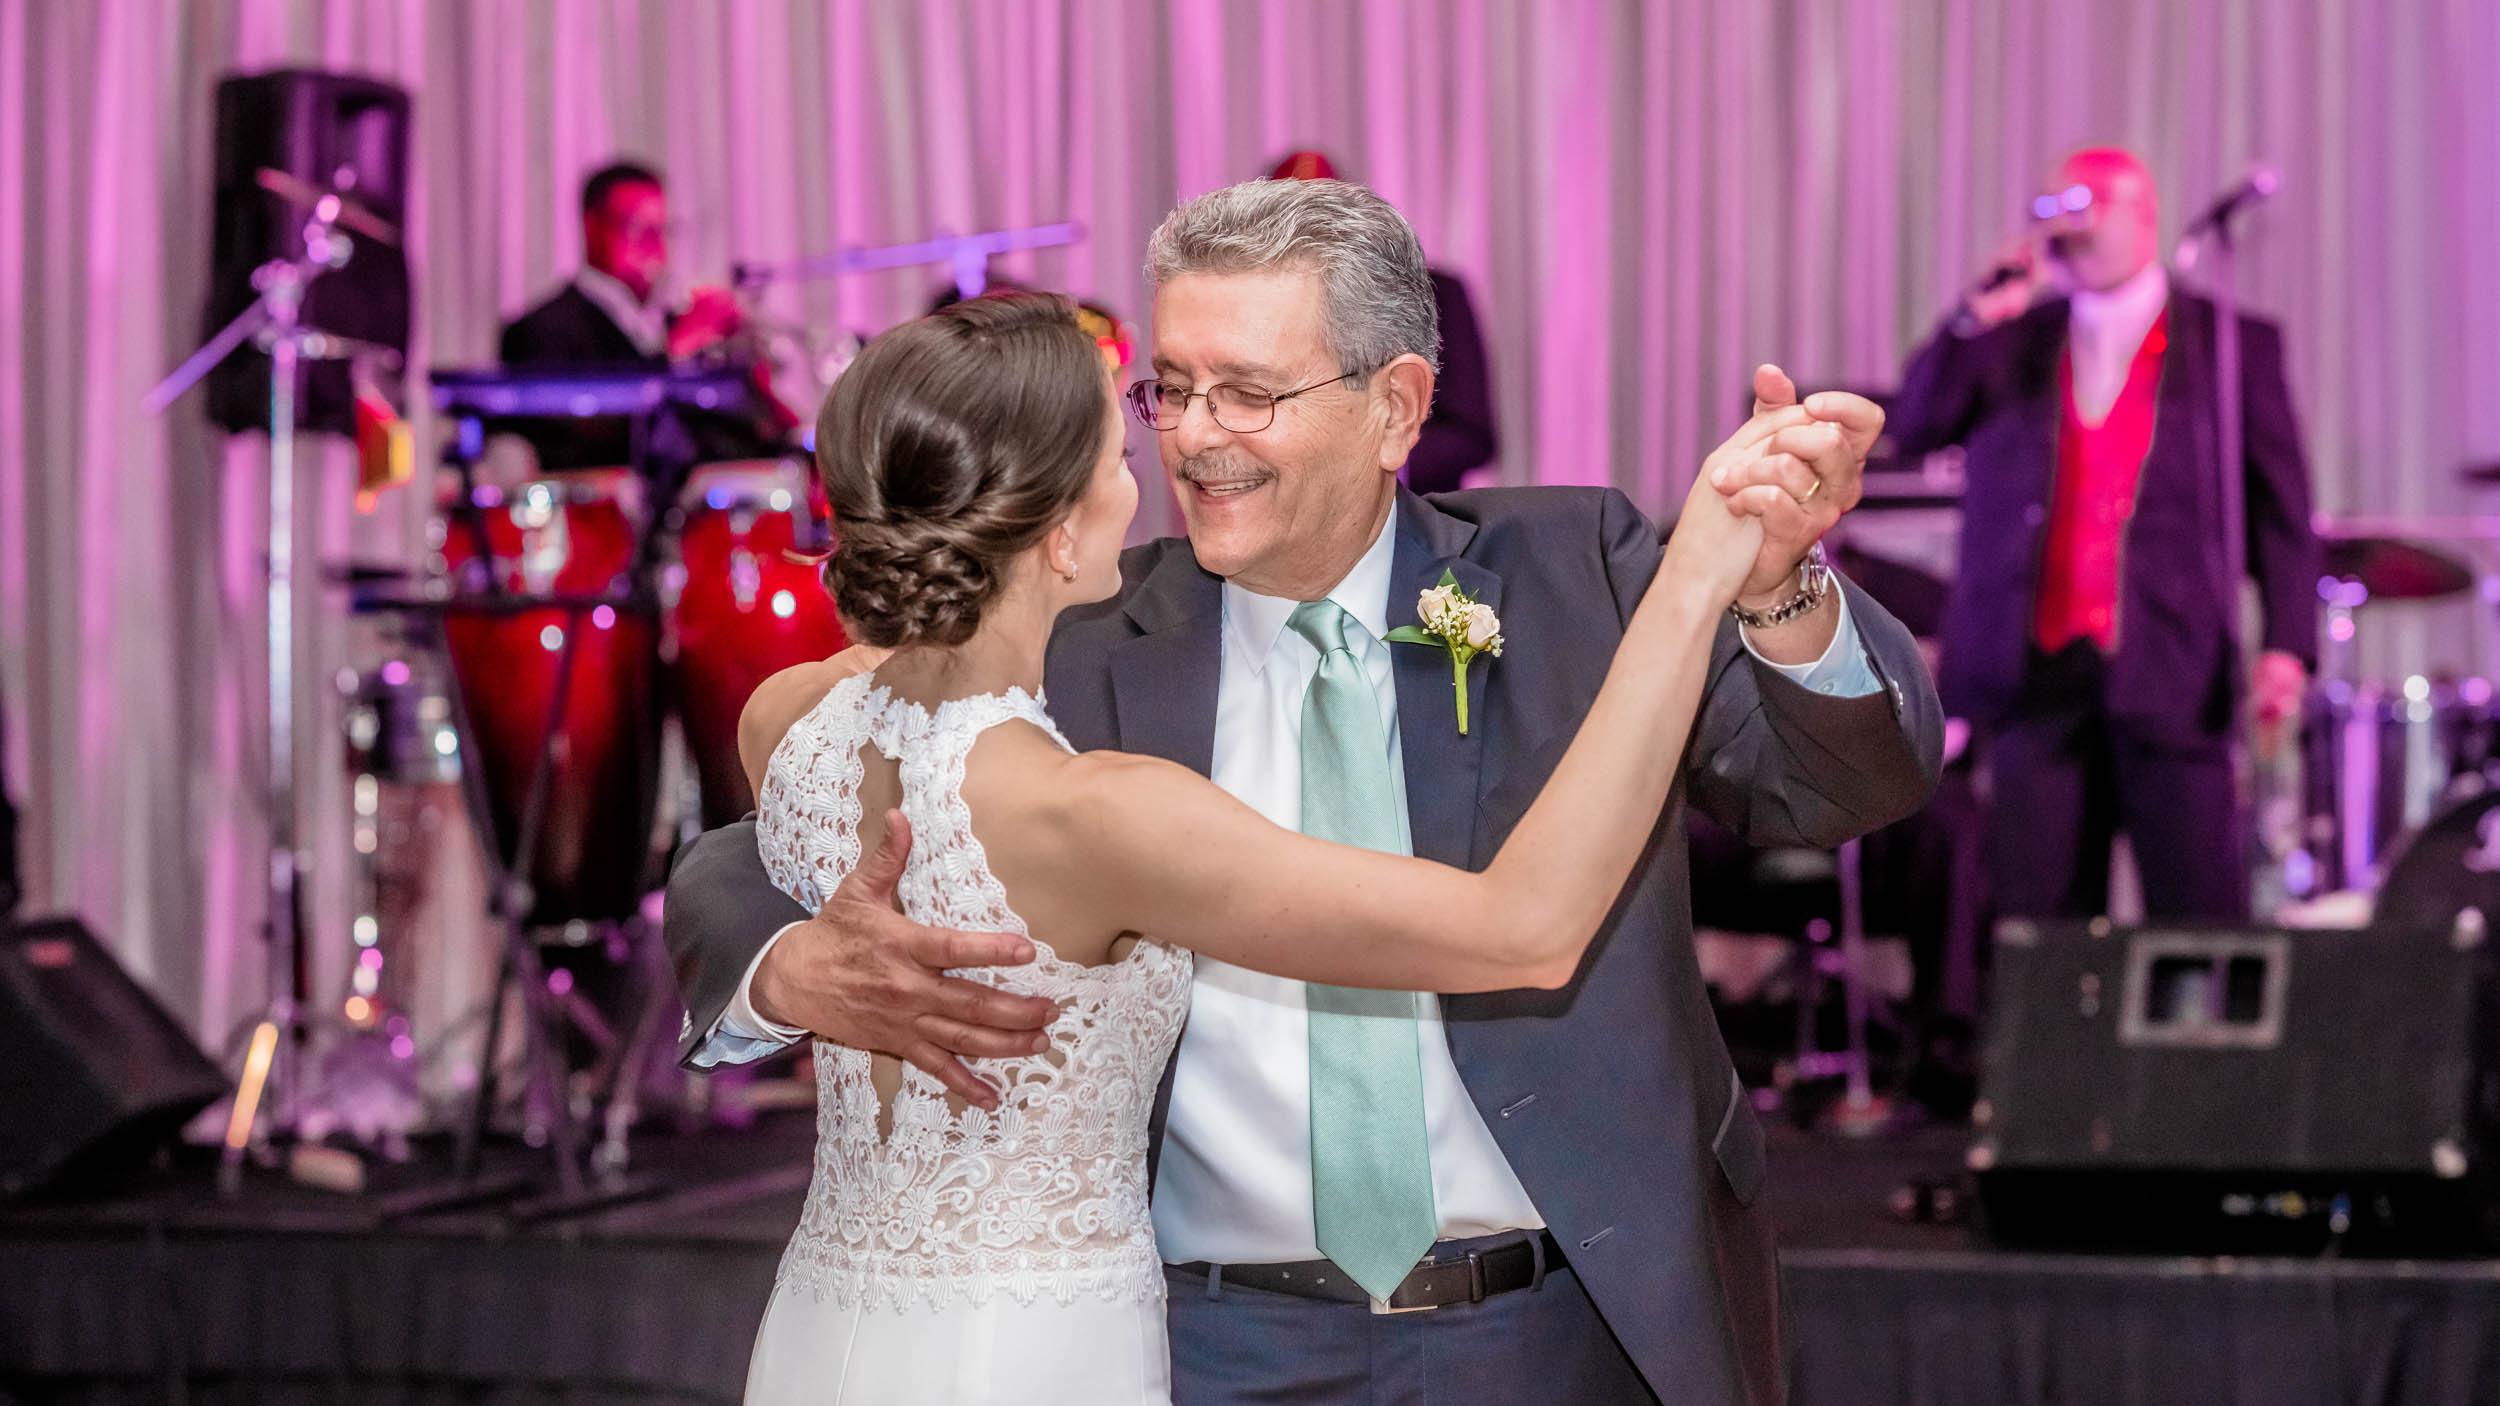 dc+metro+wedding+photographer+vadym+guliuk+photography+wedding+parent+dances-2029.jpg